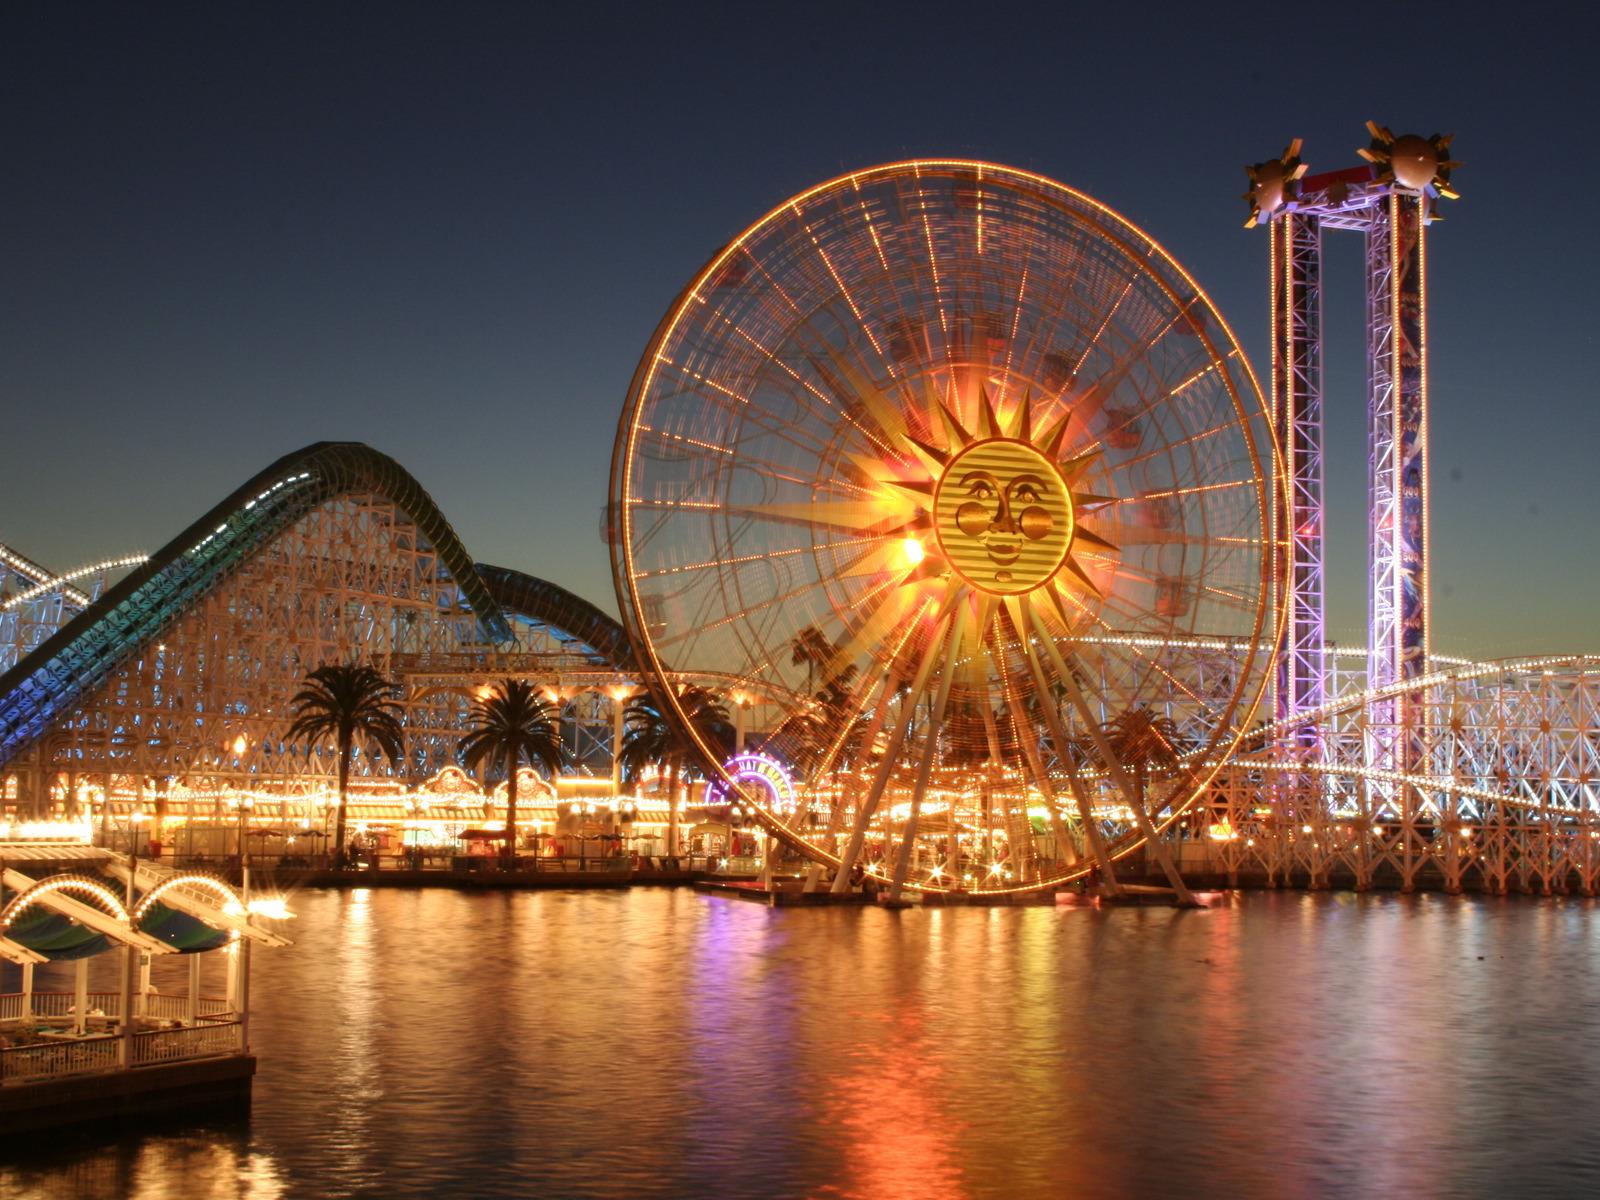 The Ferris Wheel Ferris Wheel Ferris Wheel